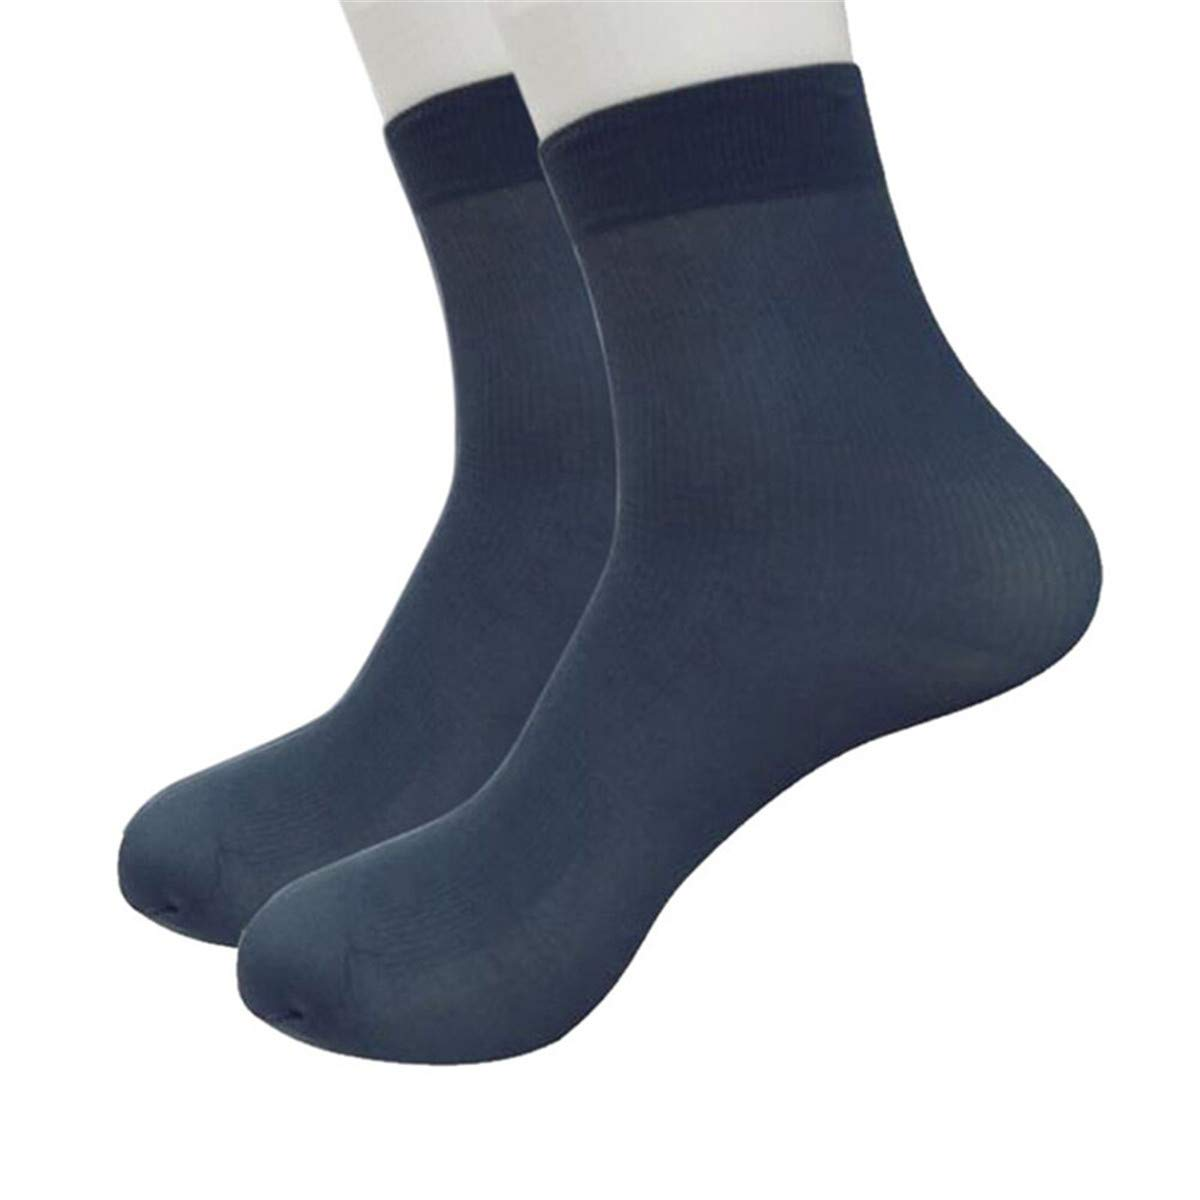 0b3cd294de69e0 Zolimx Herren Socken Bambusfaser Ultradünne Elastische Seidige kurze ...